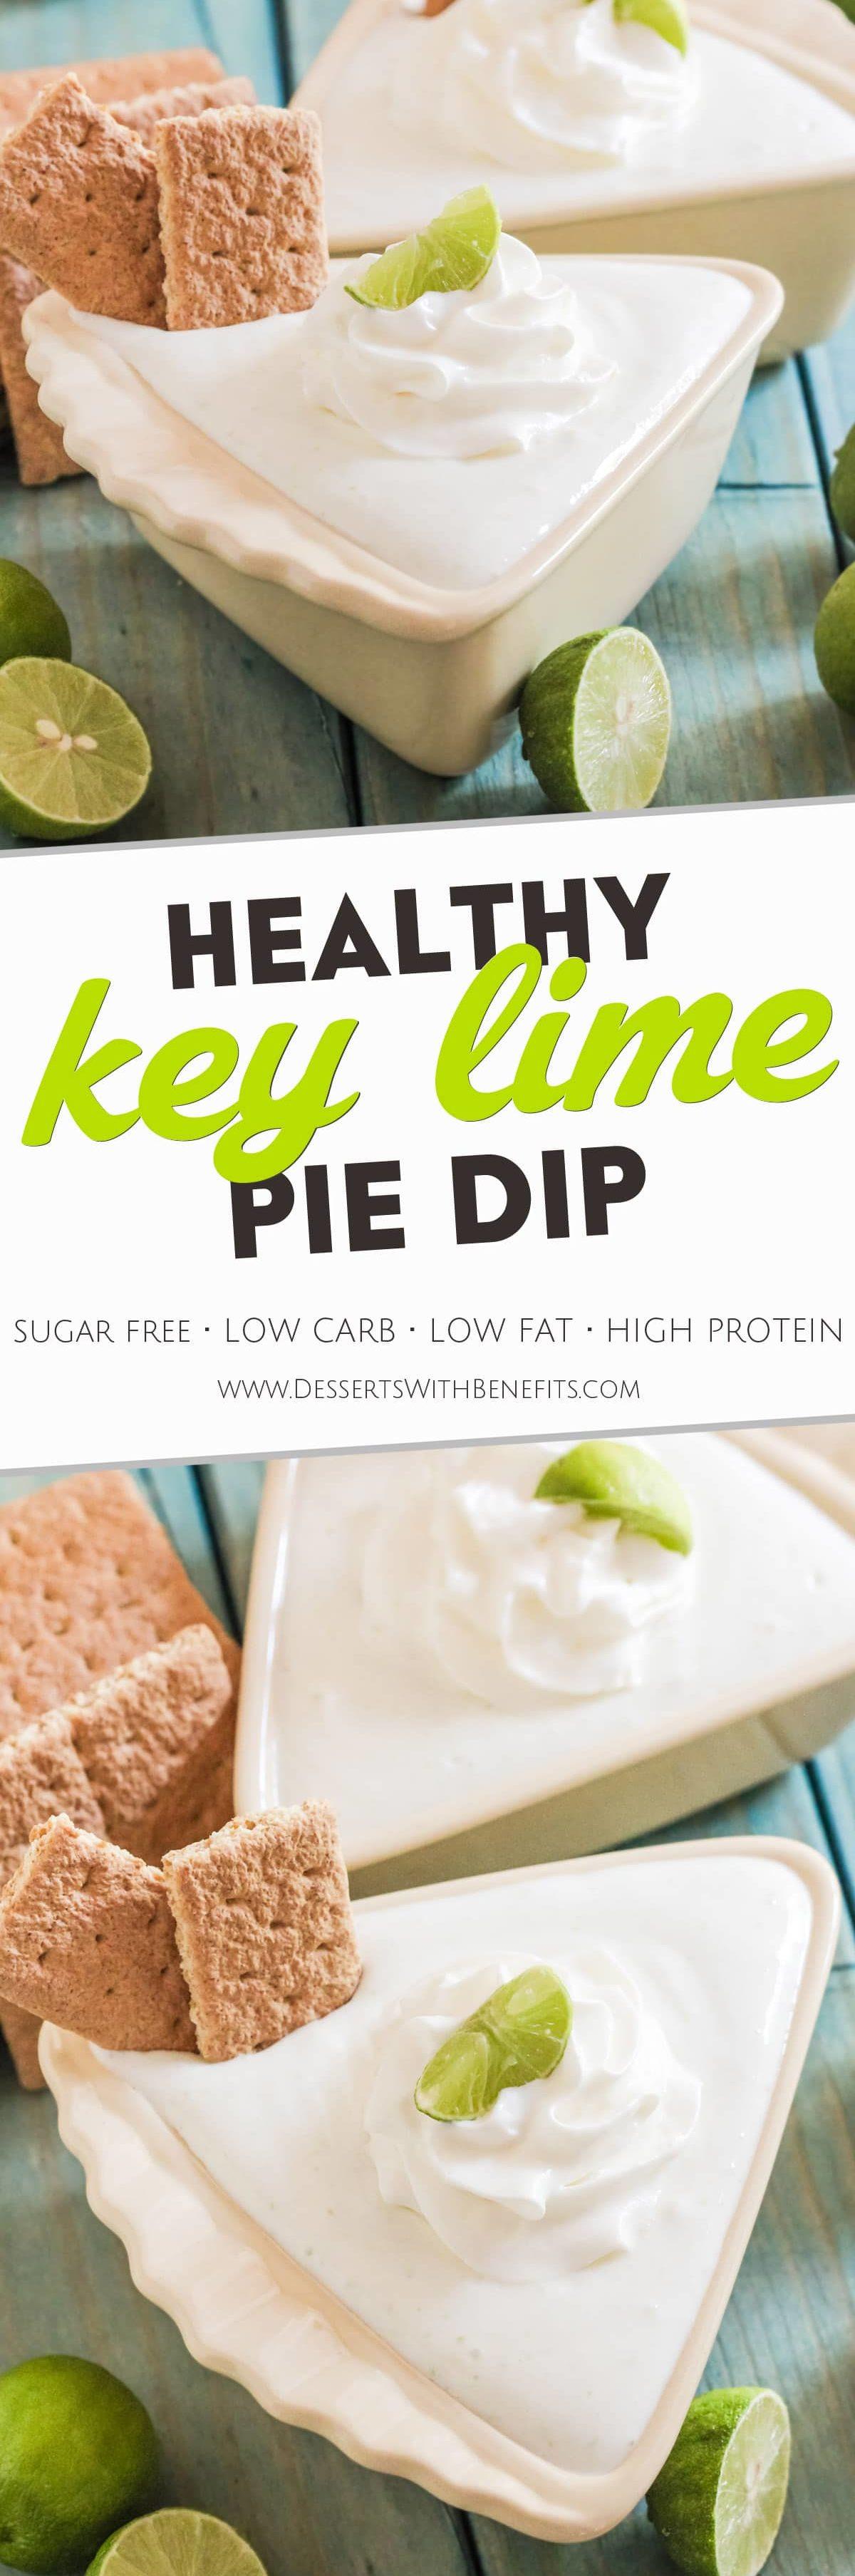 Low Calorie Key Lime Pie  Healthy Key Lime Pie Dip Recipe